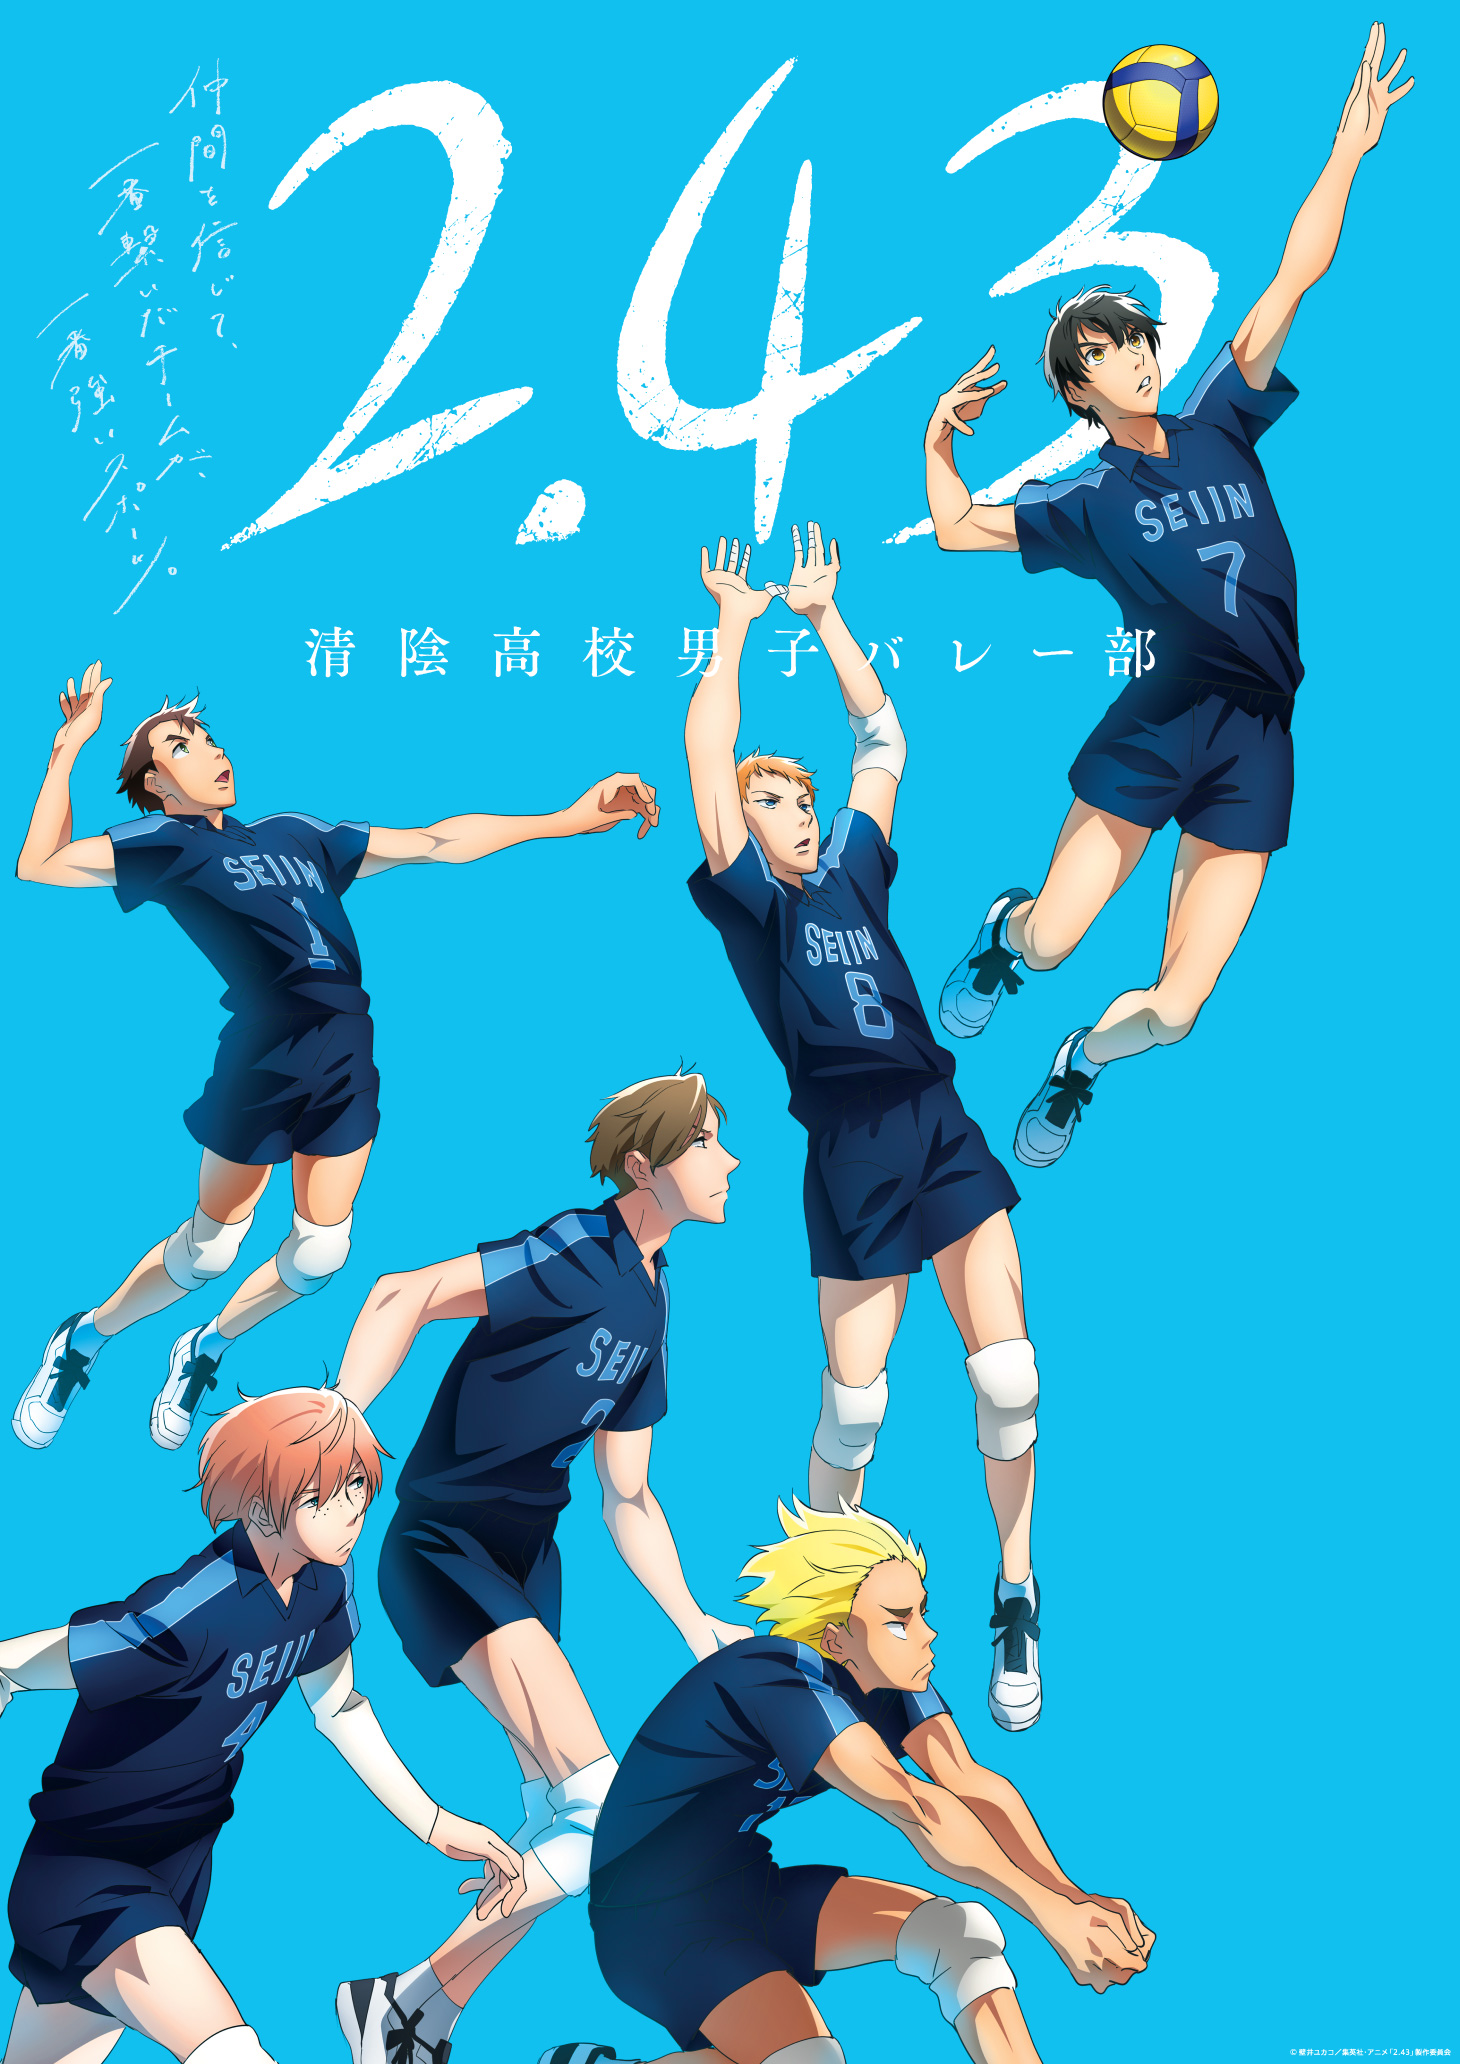 Seiin-Teaser-Visual 2.43: Seiin Koukou Danshi Volley-bu (2.43: Seiin High School Boys Volleyball Team)